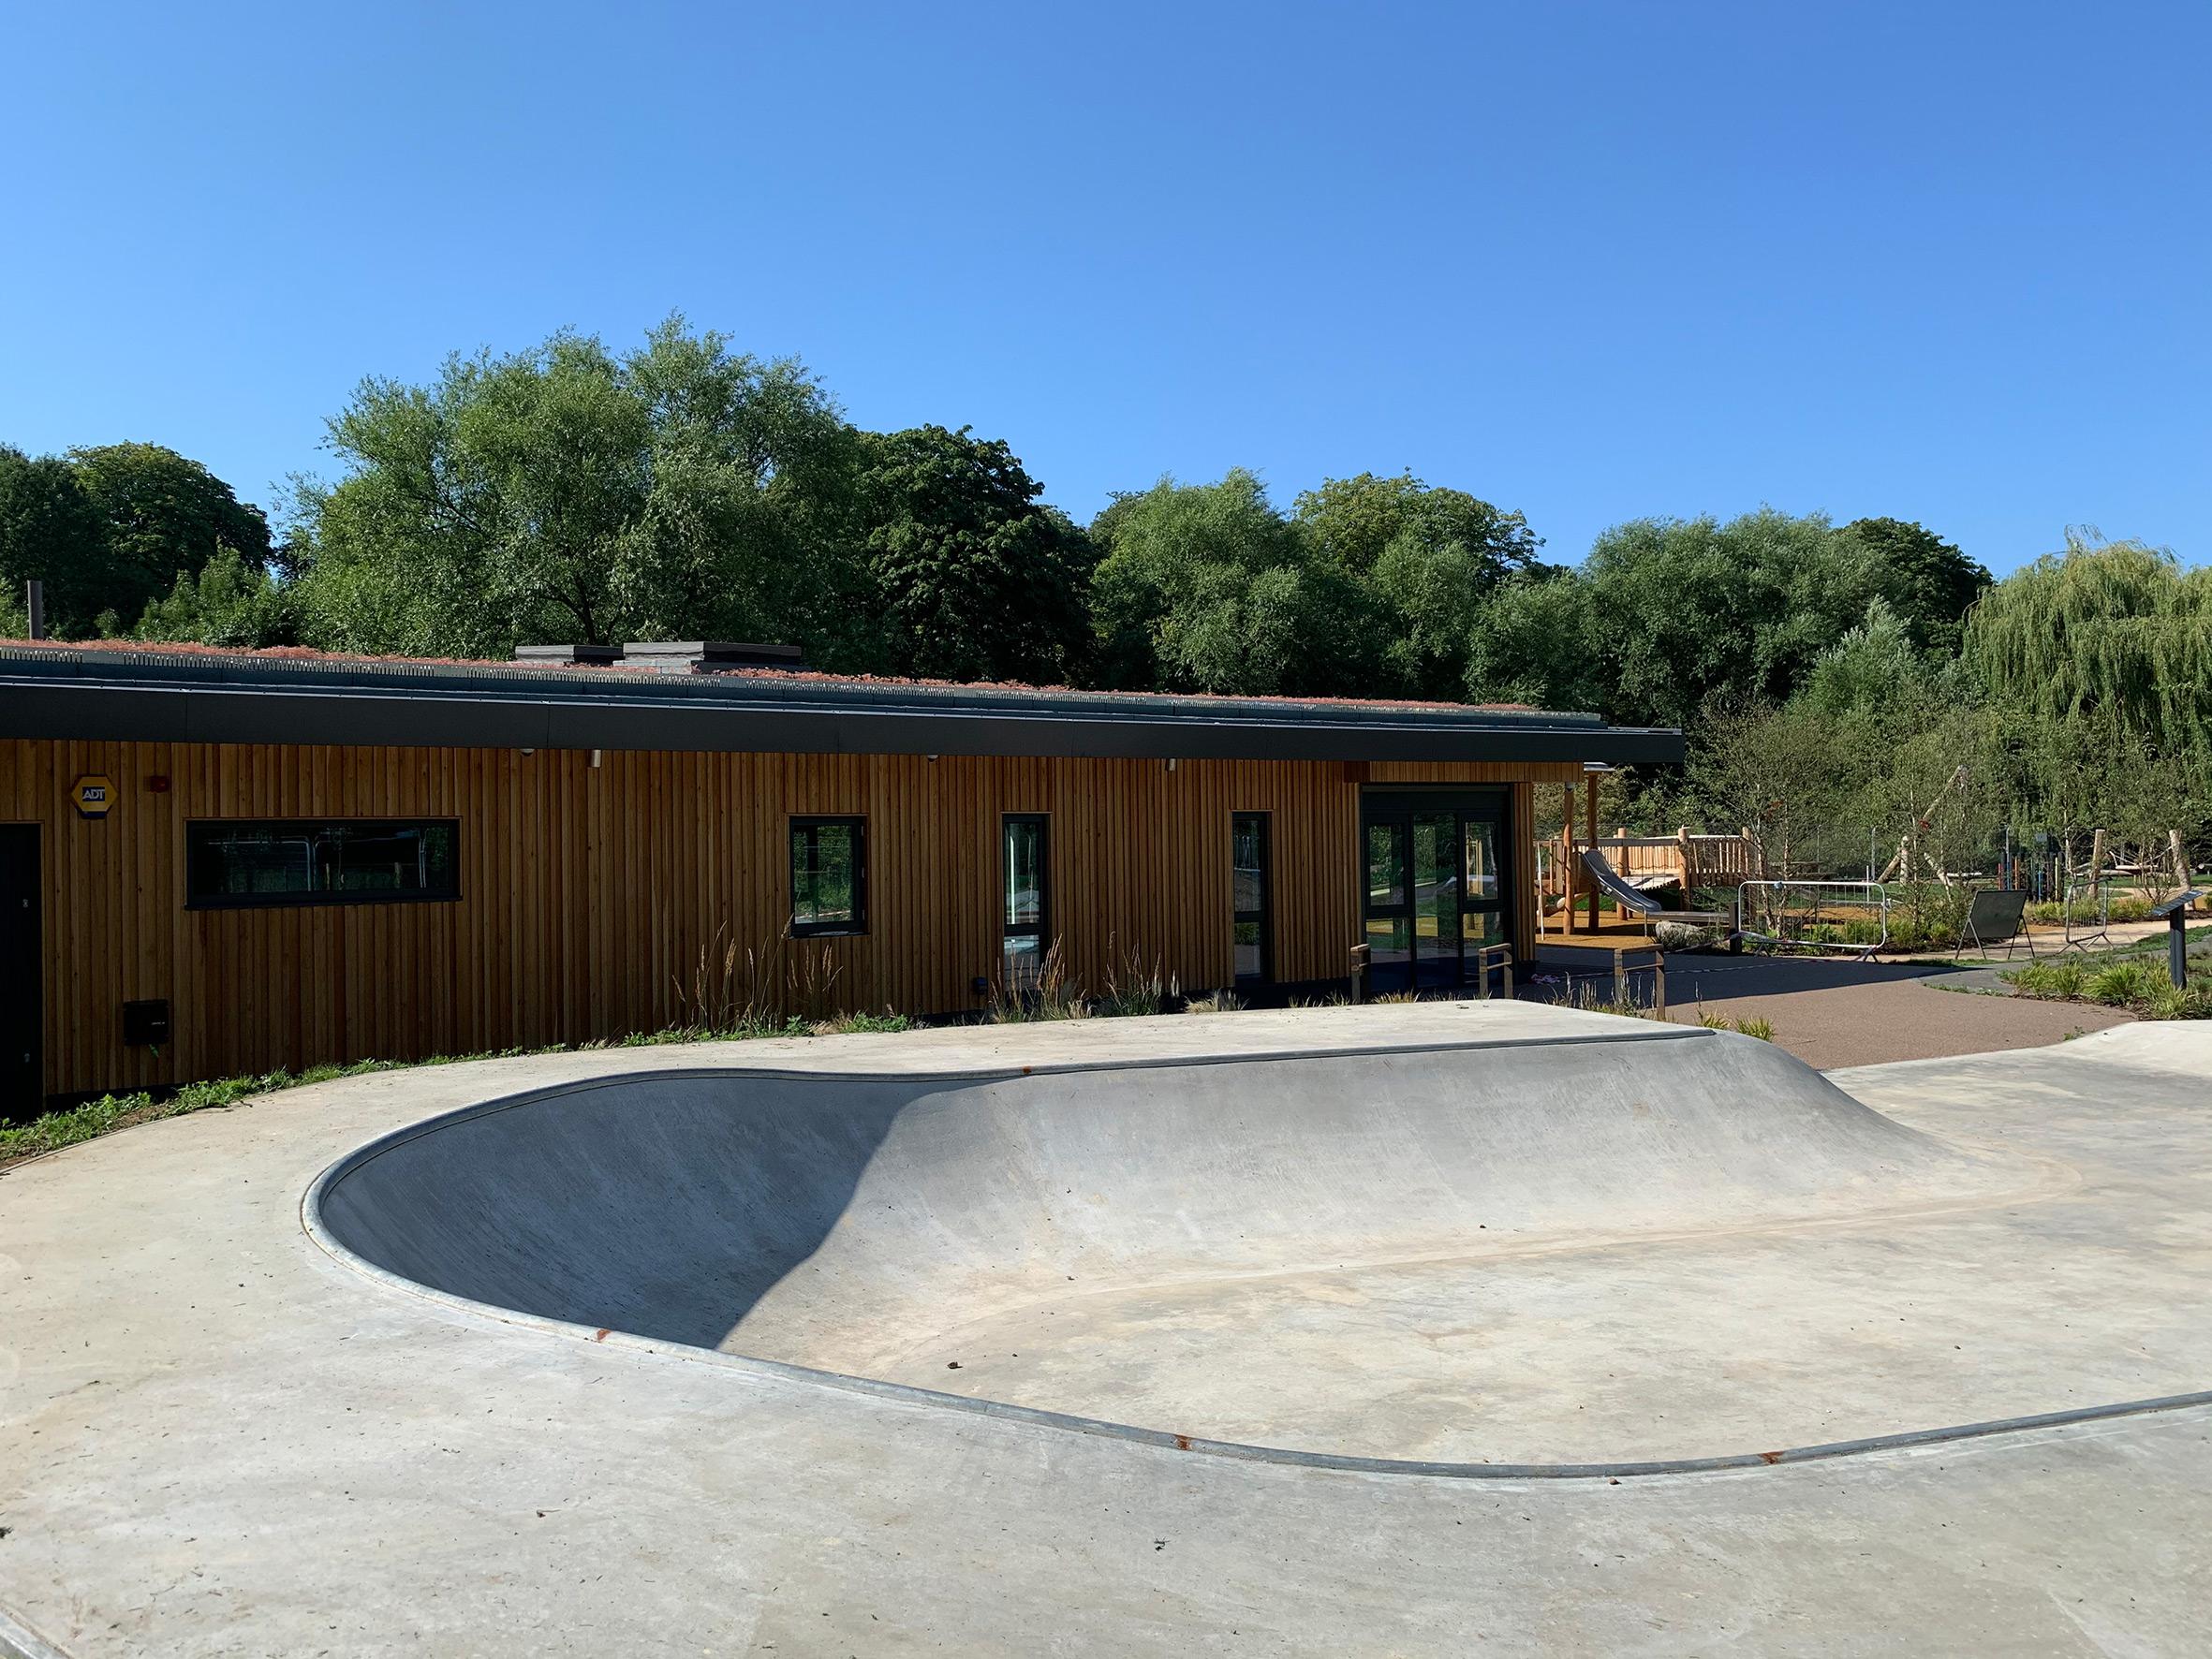 Oxhey Park skateboarding facility